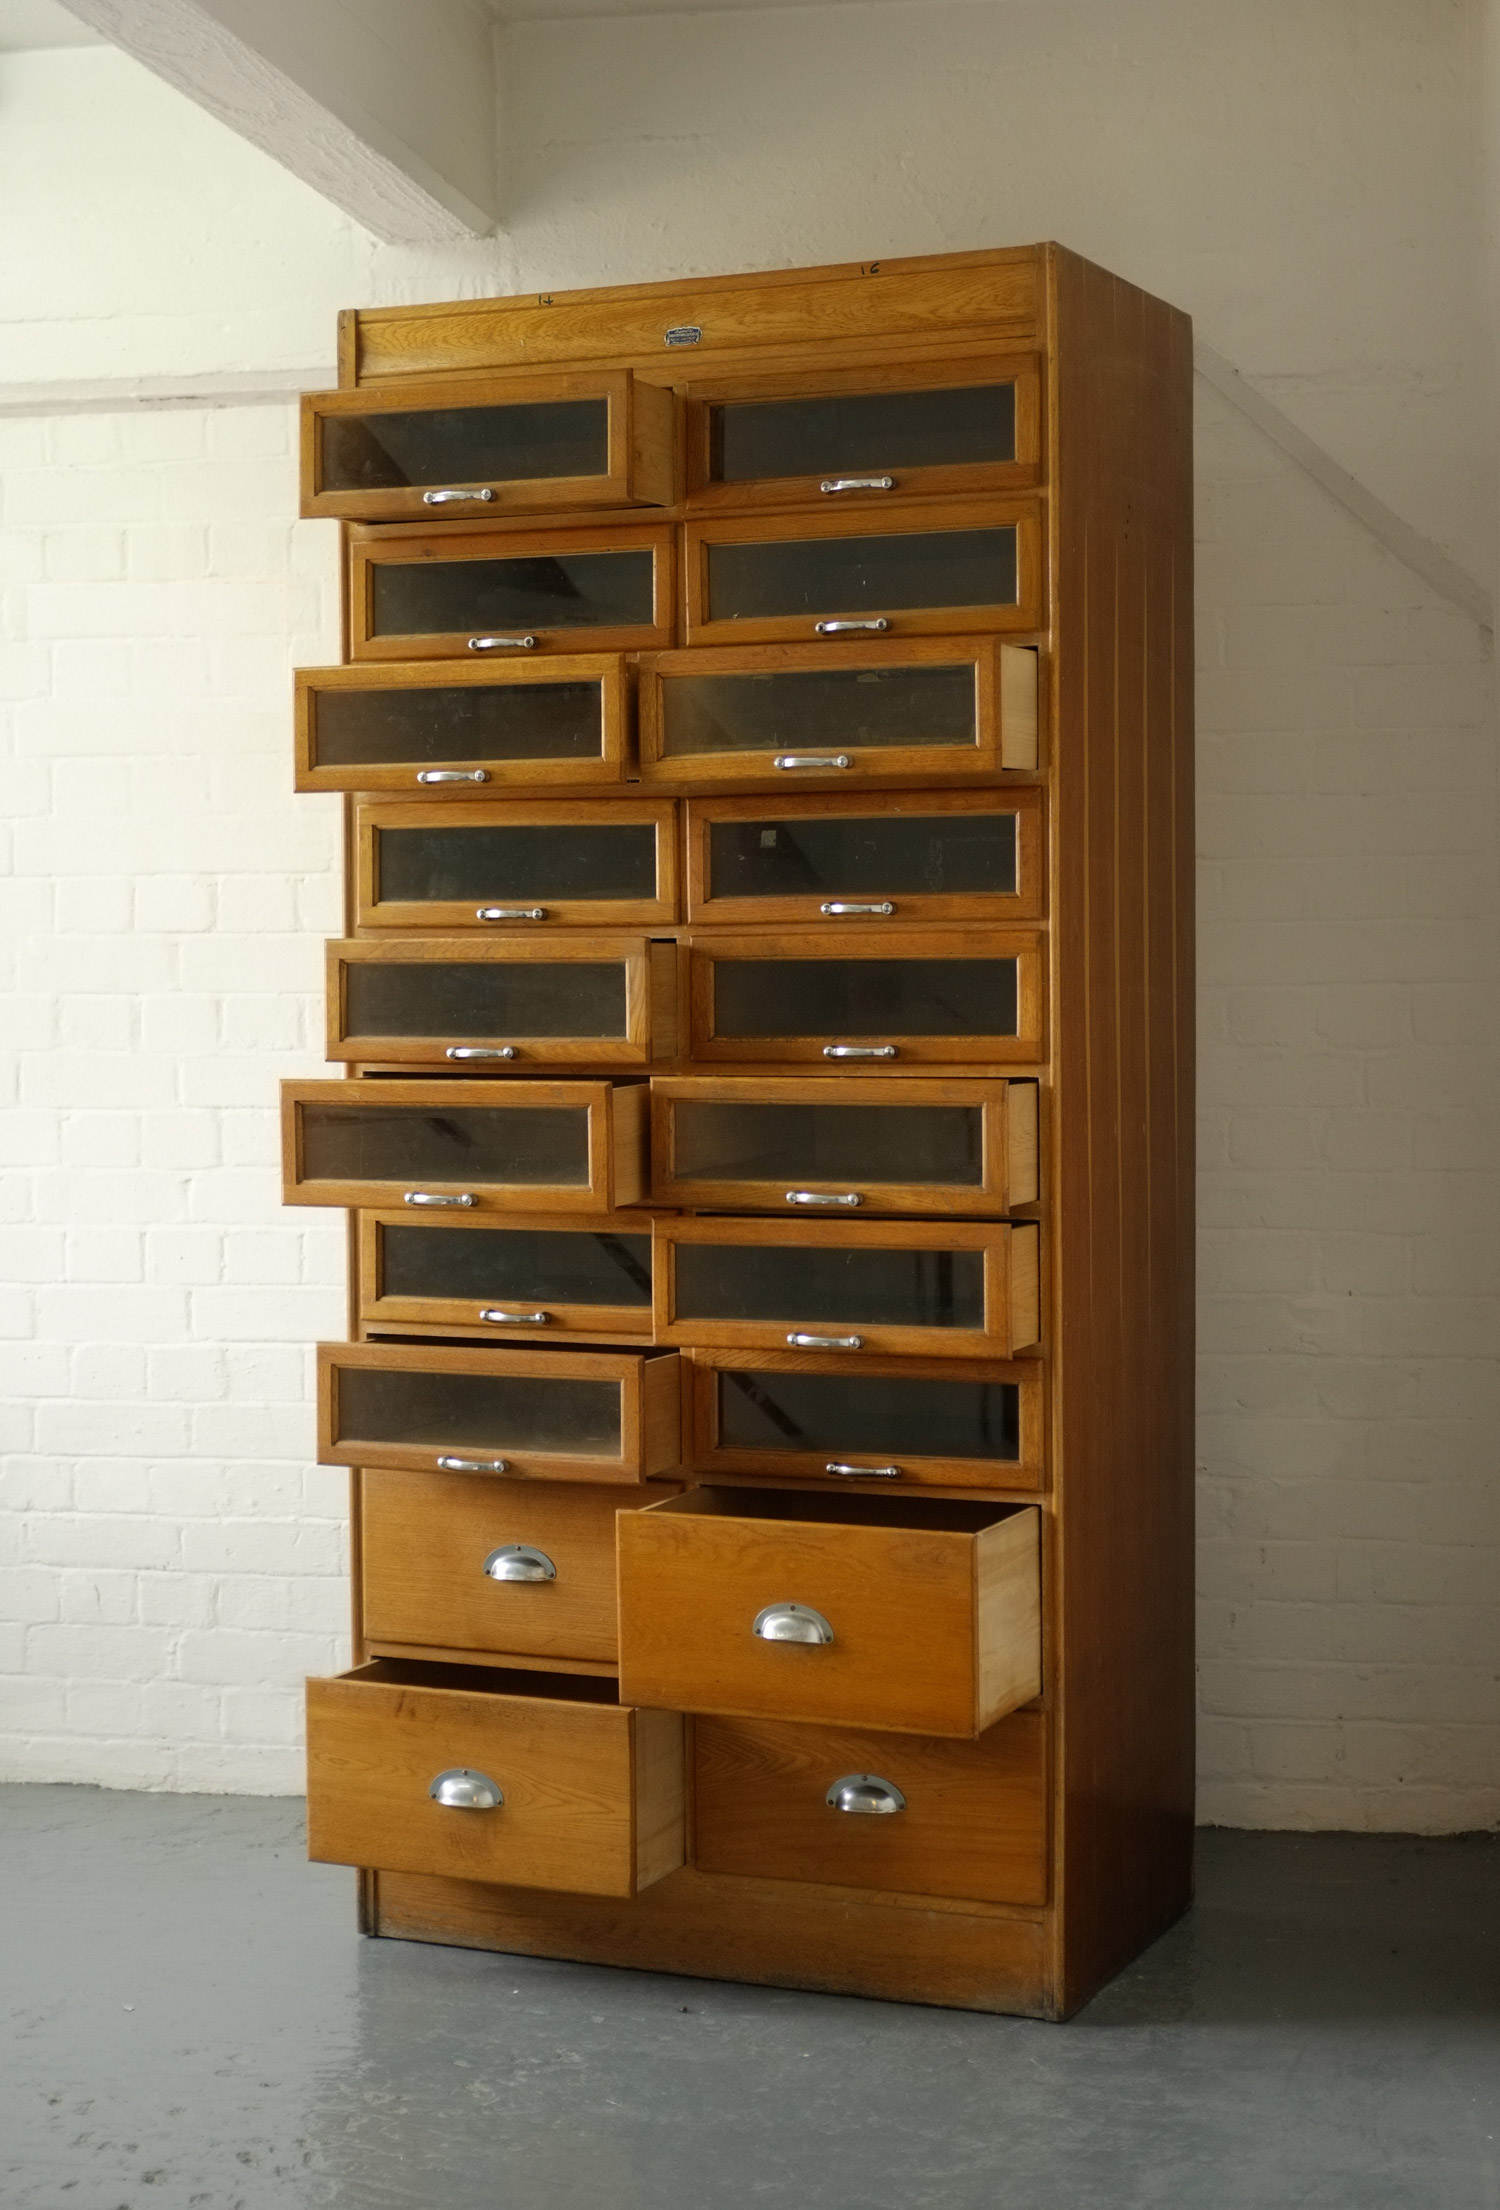 Vintage Haberdashery Cabinet Of Drawers Vintage Haberdashery Cabinet Of  Drawers ...